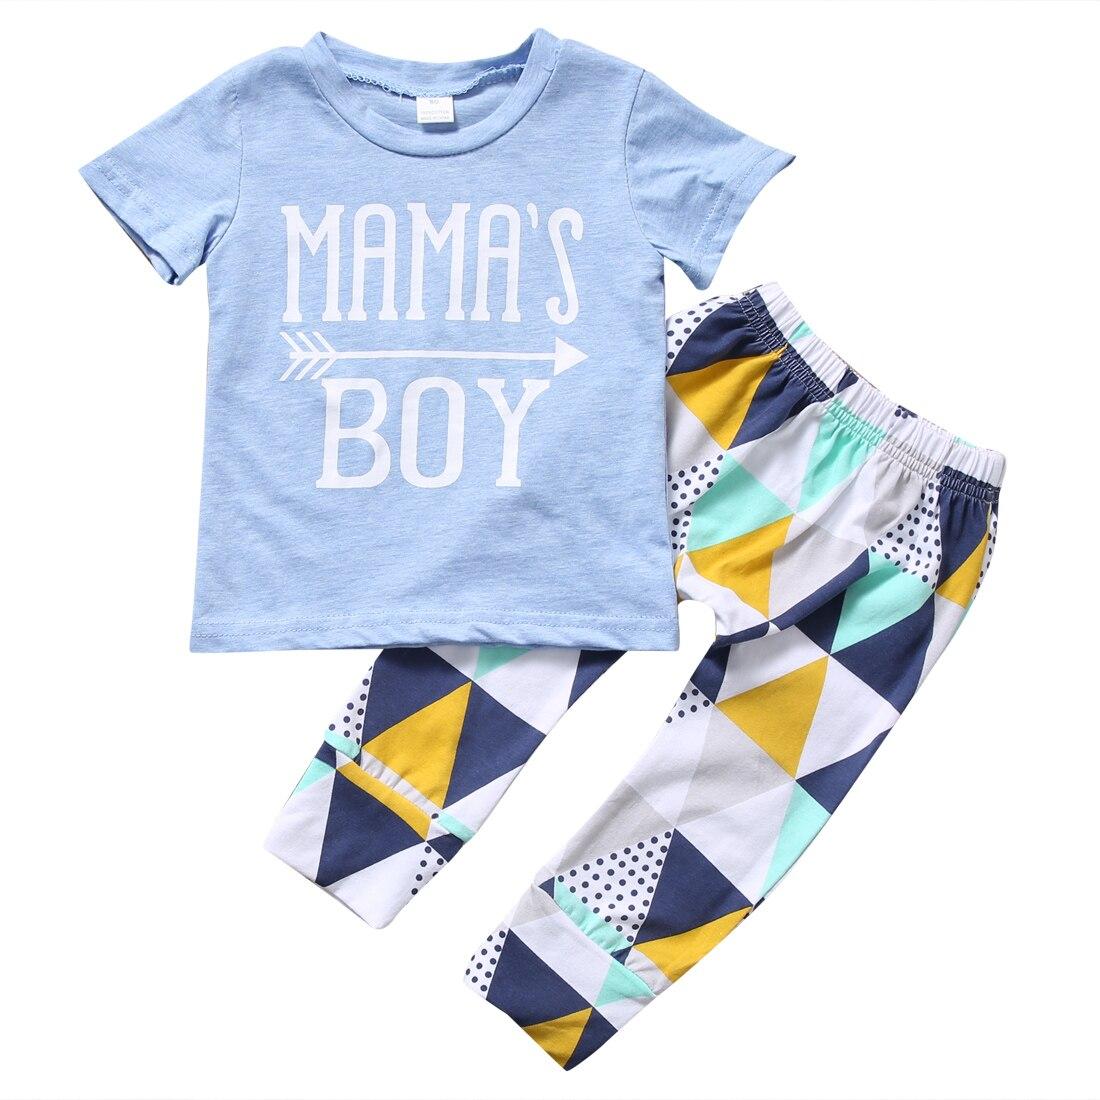 Online Buy Grosir Bayi Pakaian From China Bayi Pakaian Penjual